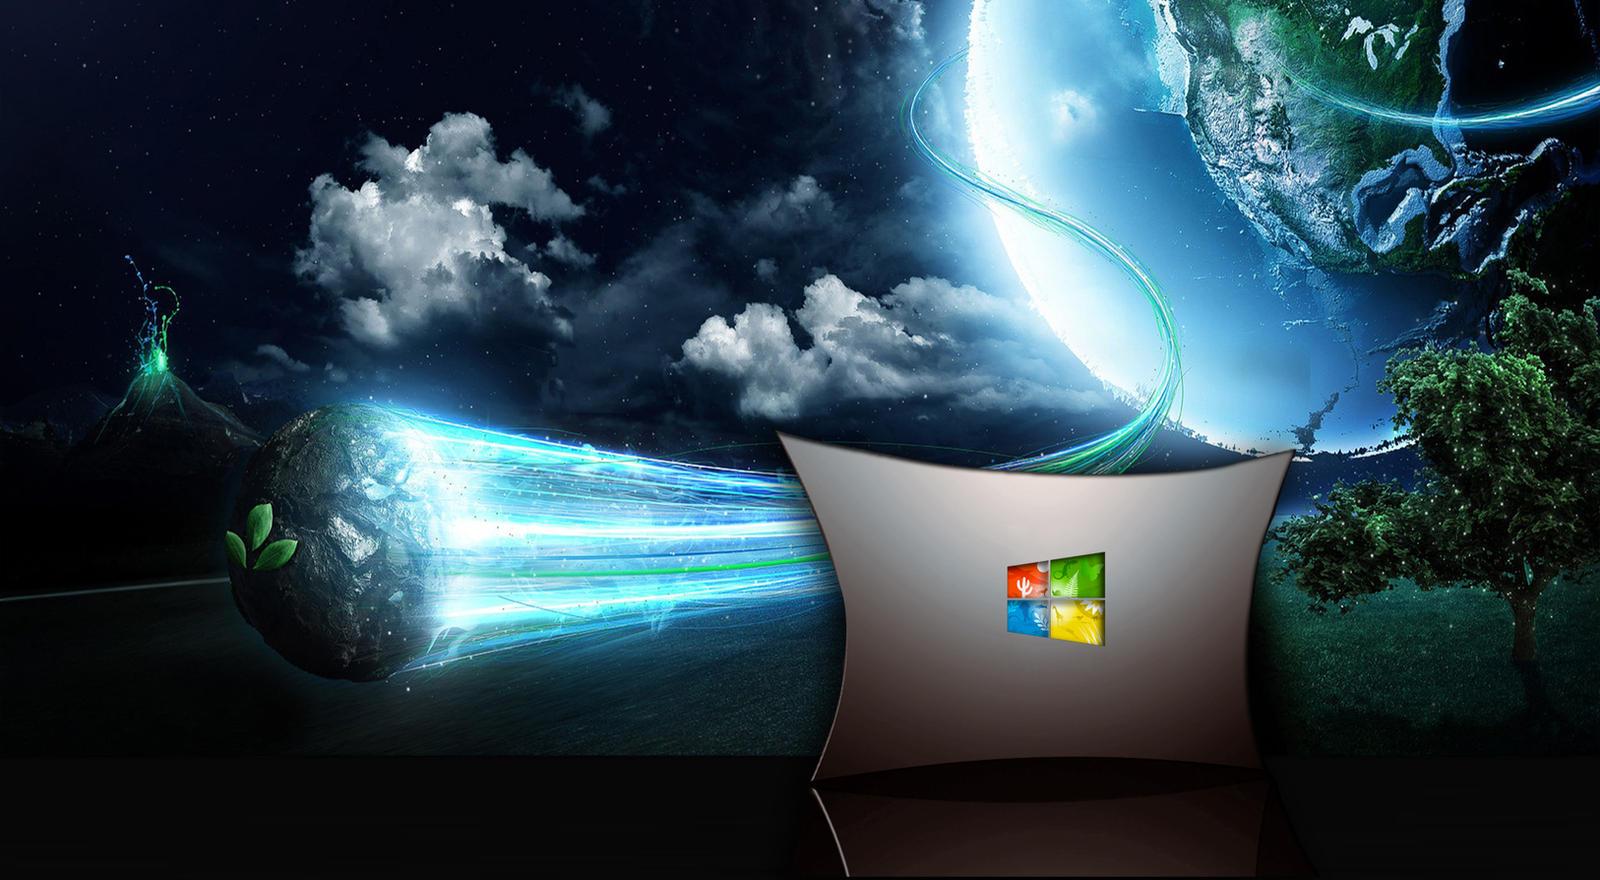 Windows 8 1 wallpaper by wallybescotty on deviantart for Window 8 1 wallpaper